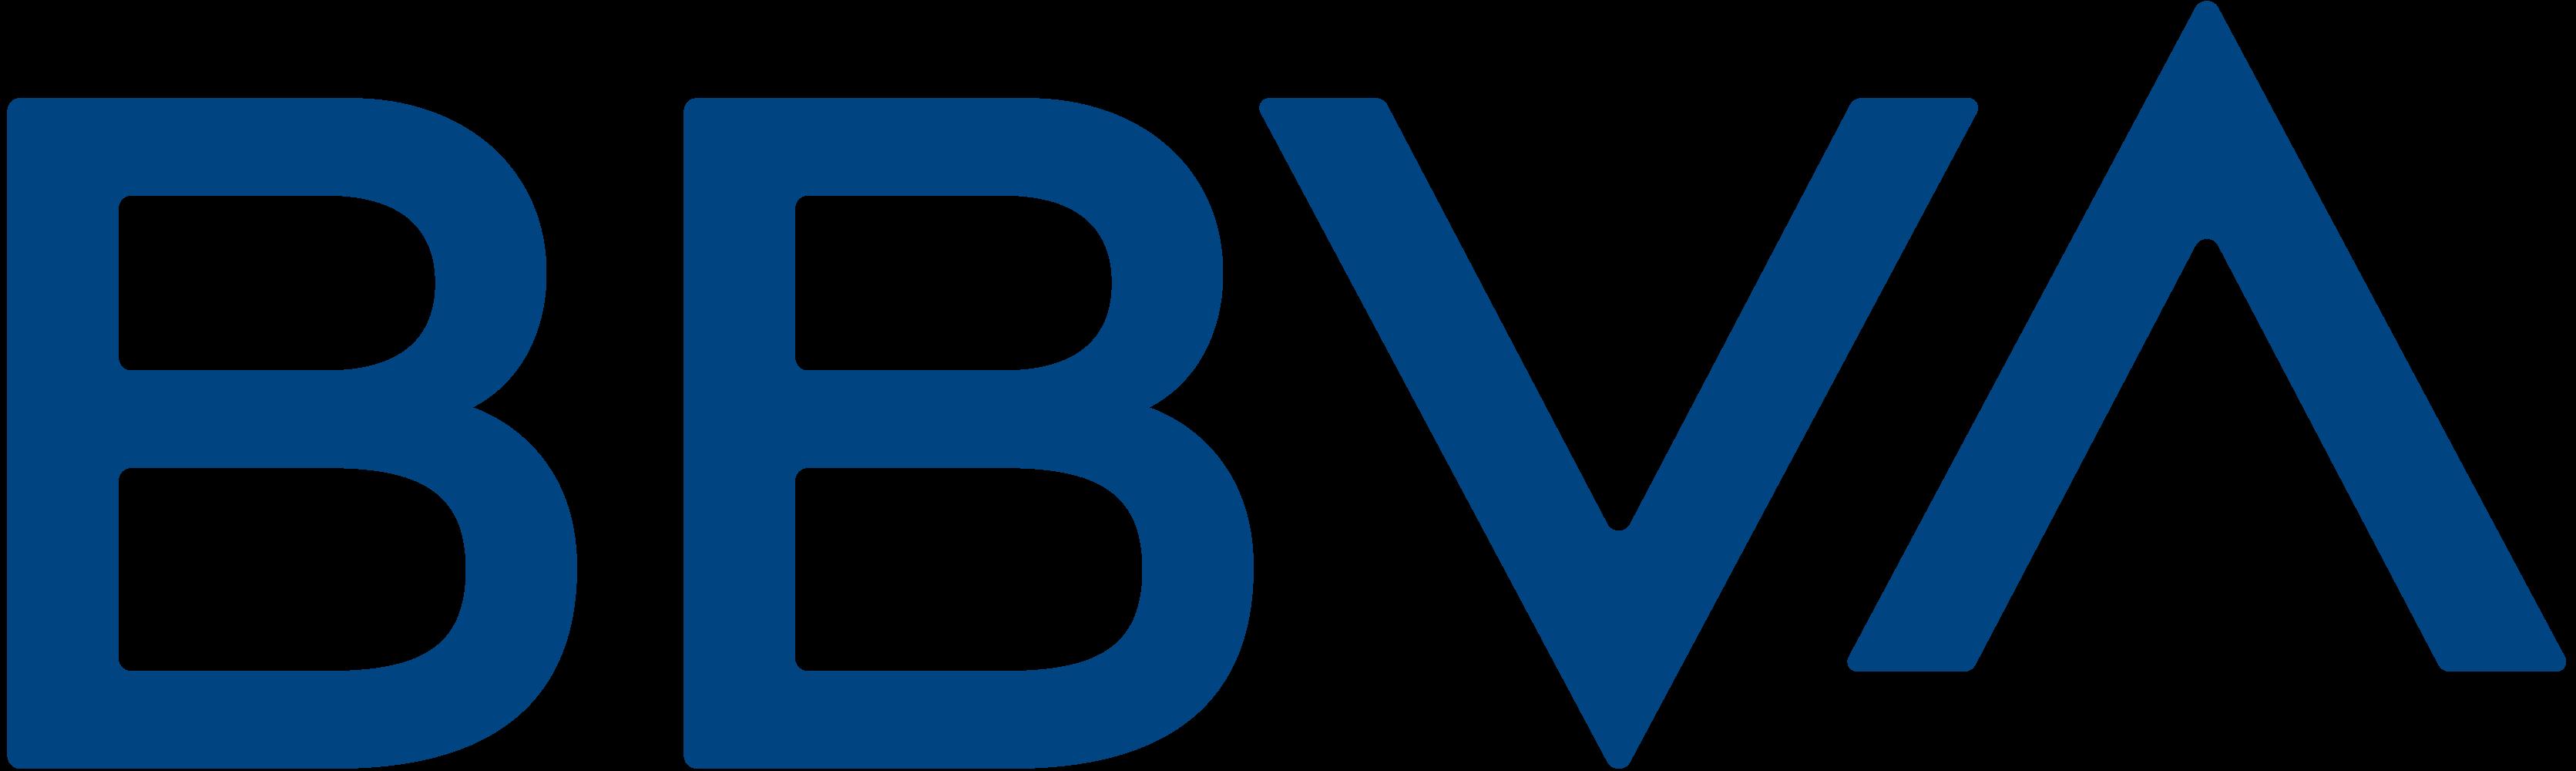 logo BBVA Continental